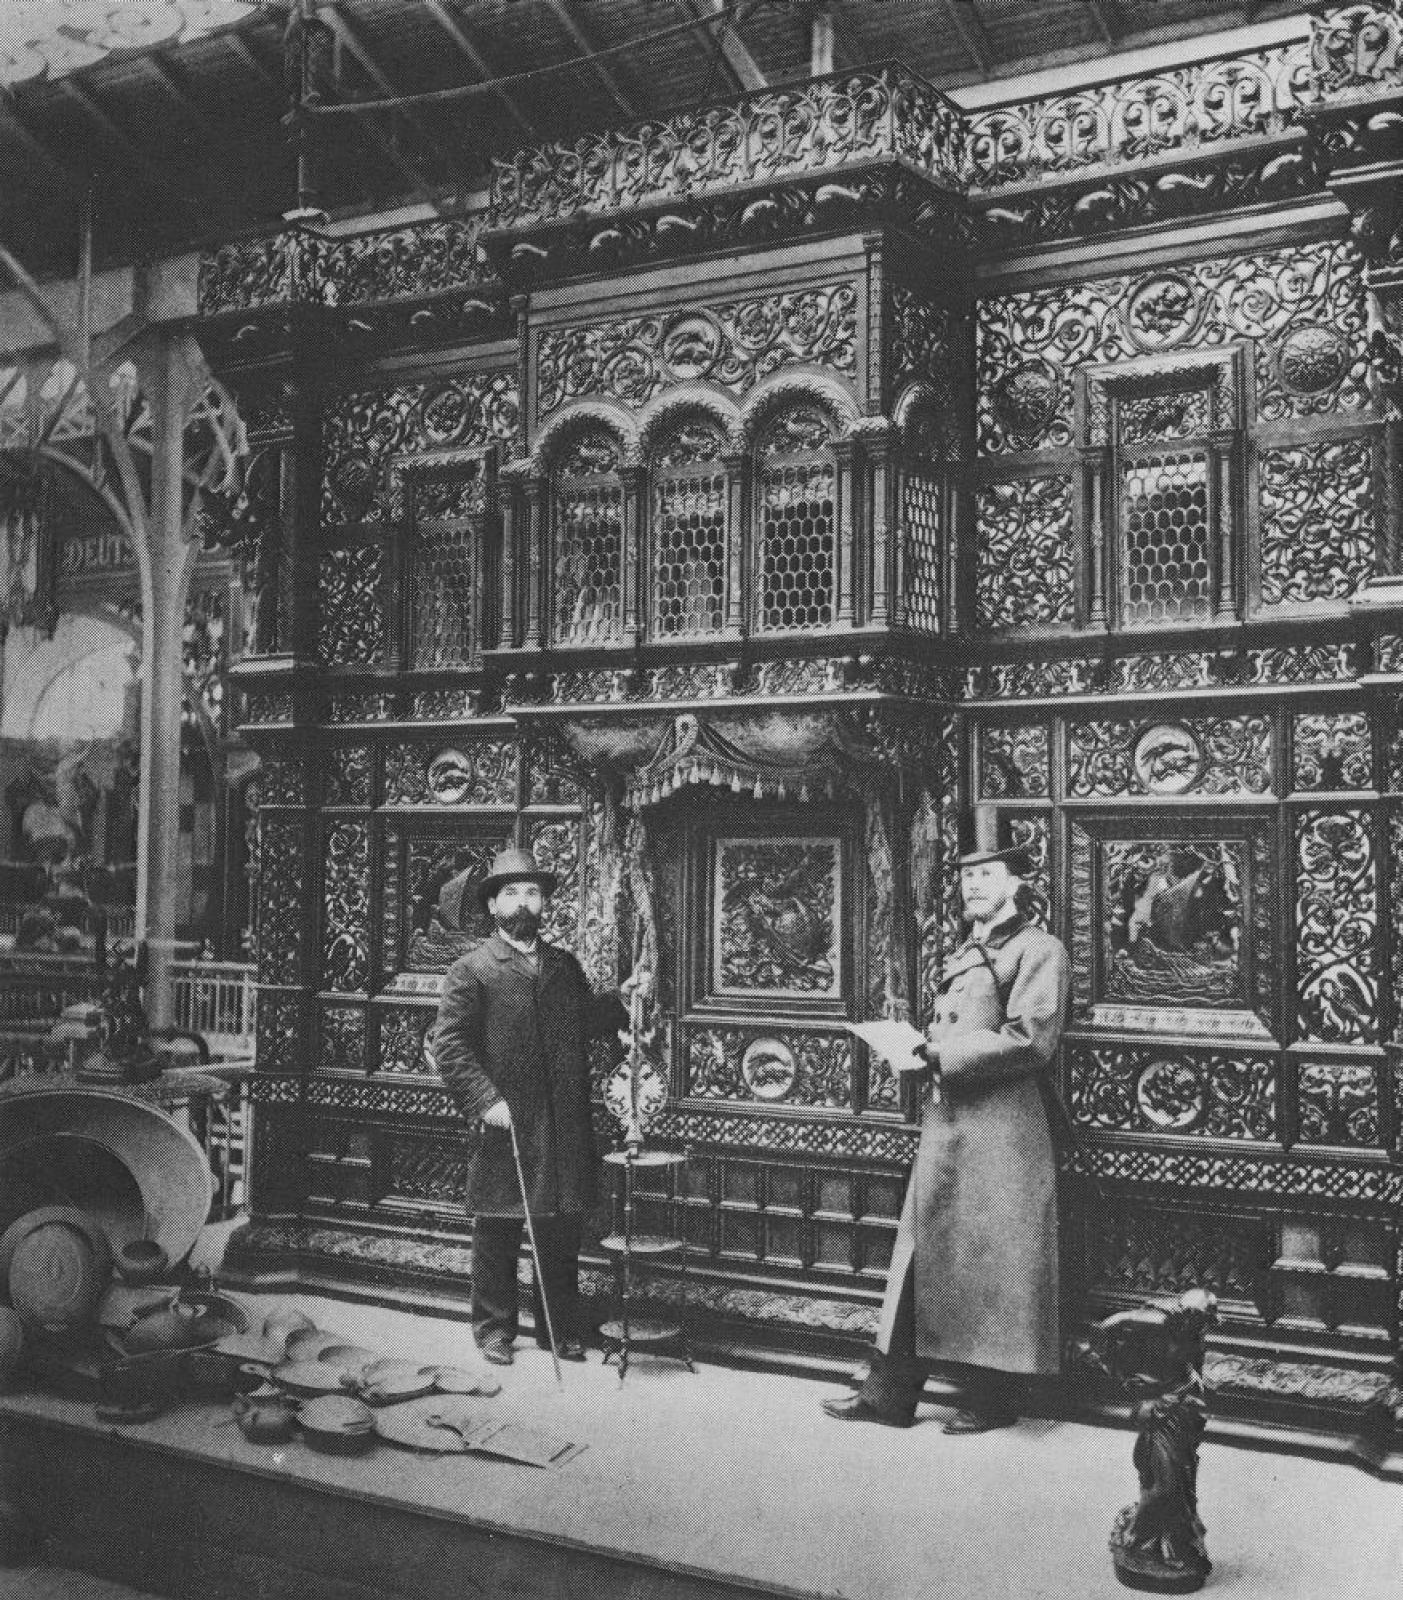 The openwork cast-iron pavilion of Kasli iron, awarded the Grand Prix at the 1900 World Exhibition.